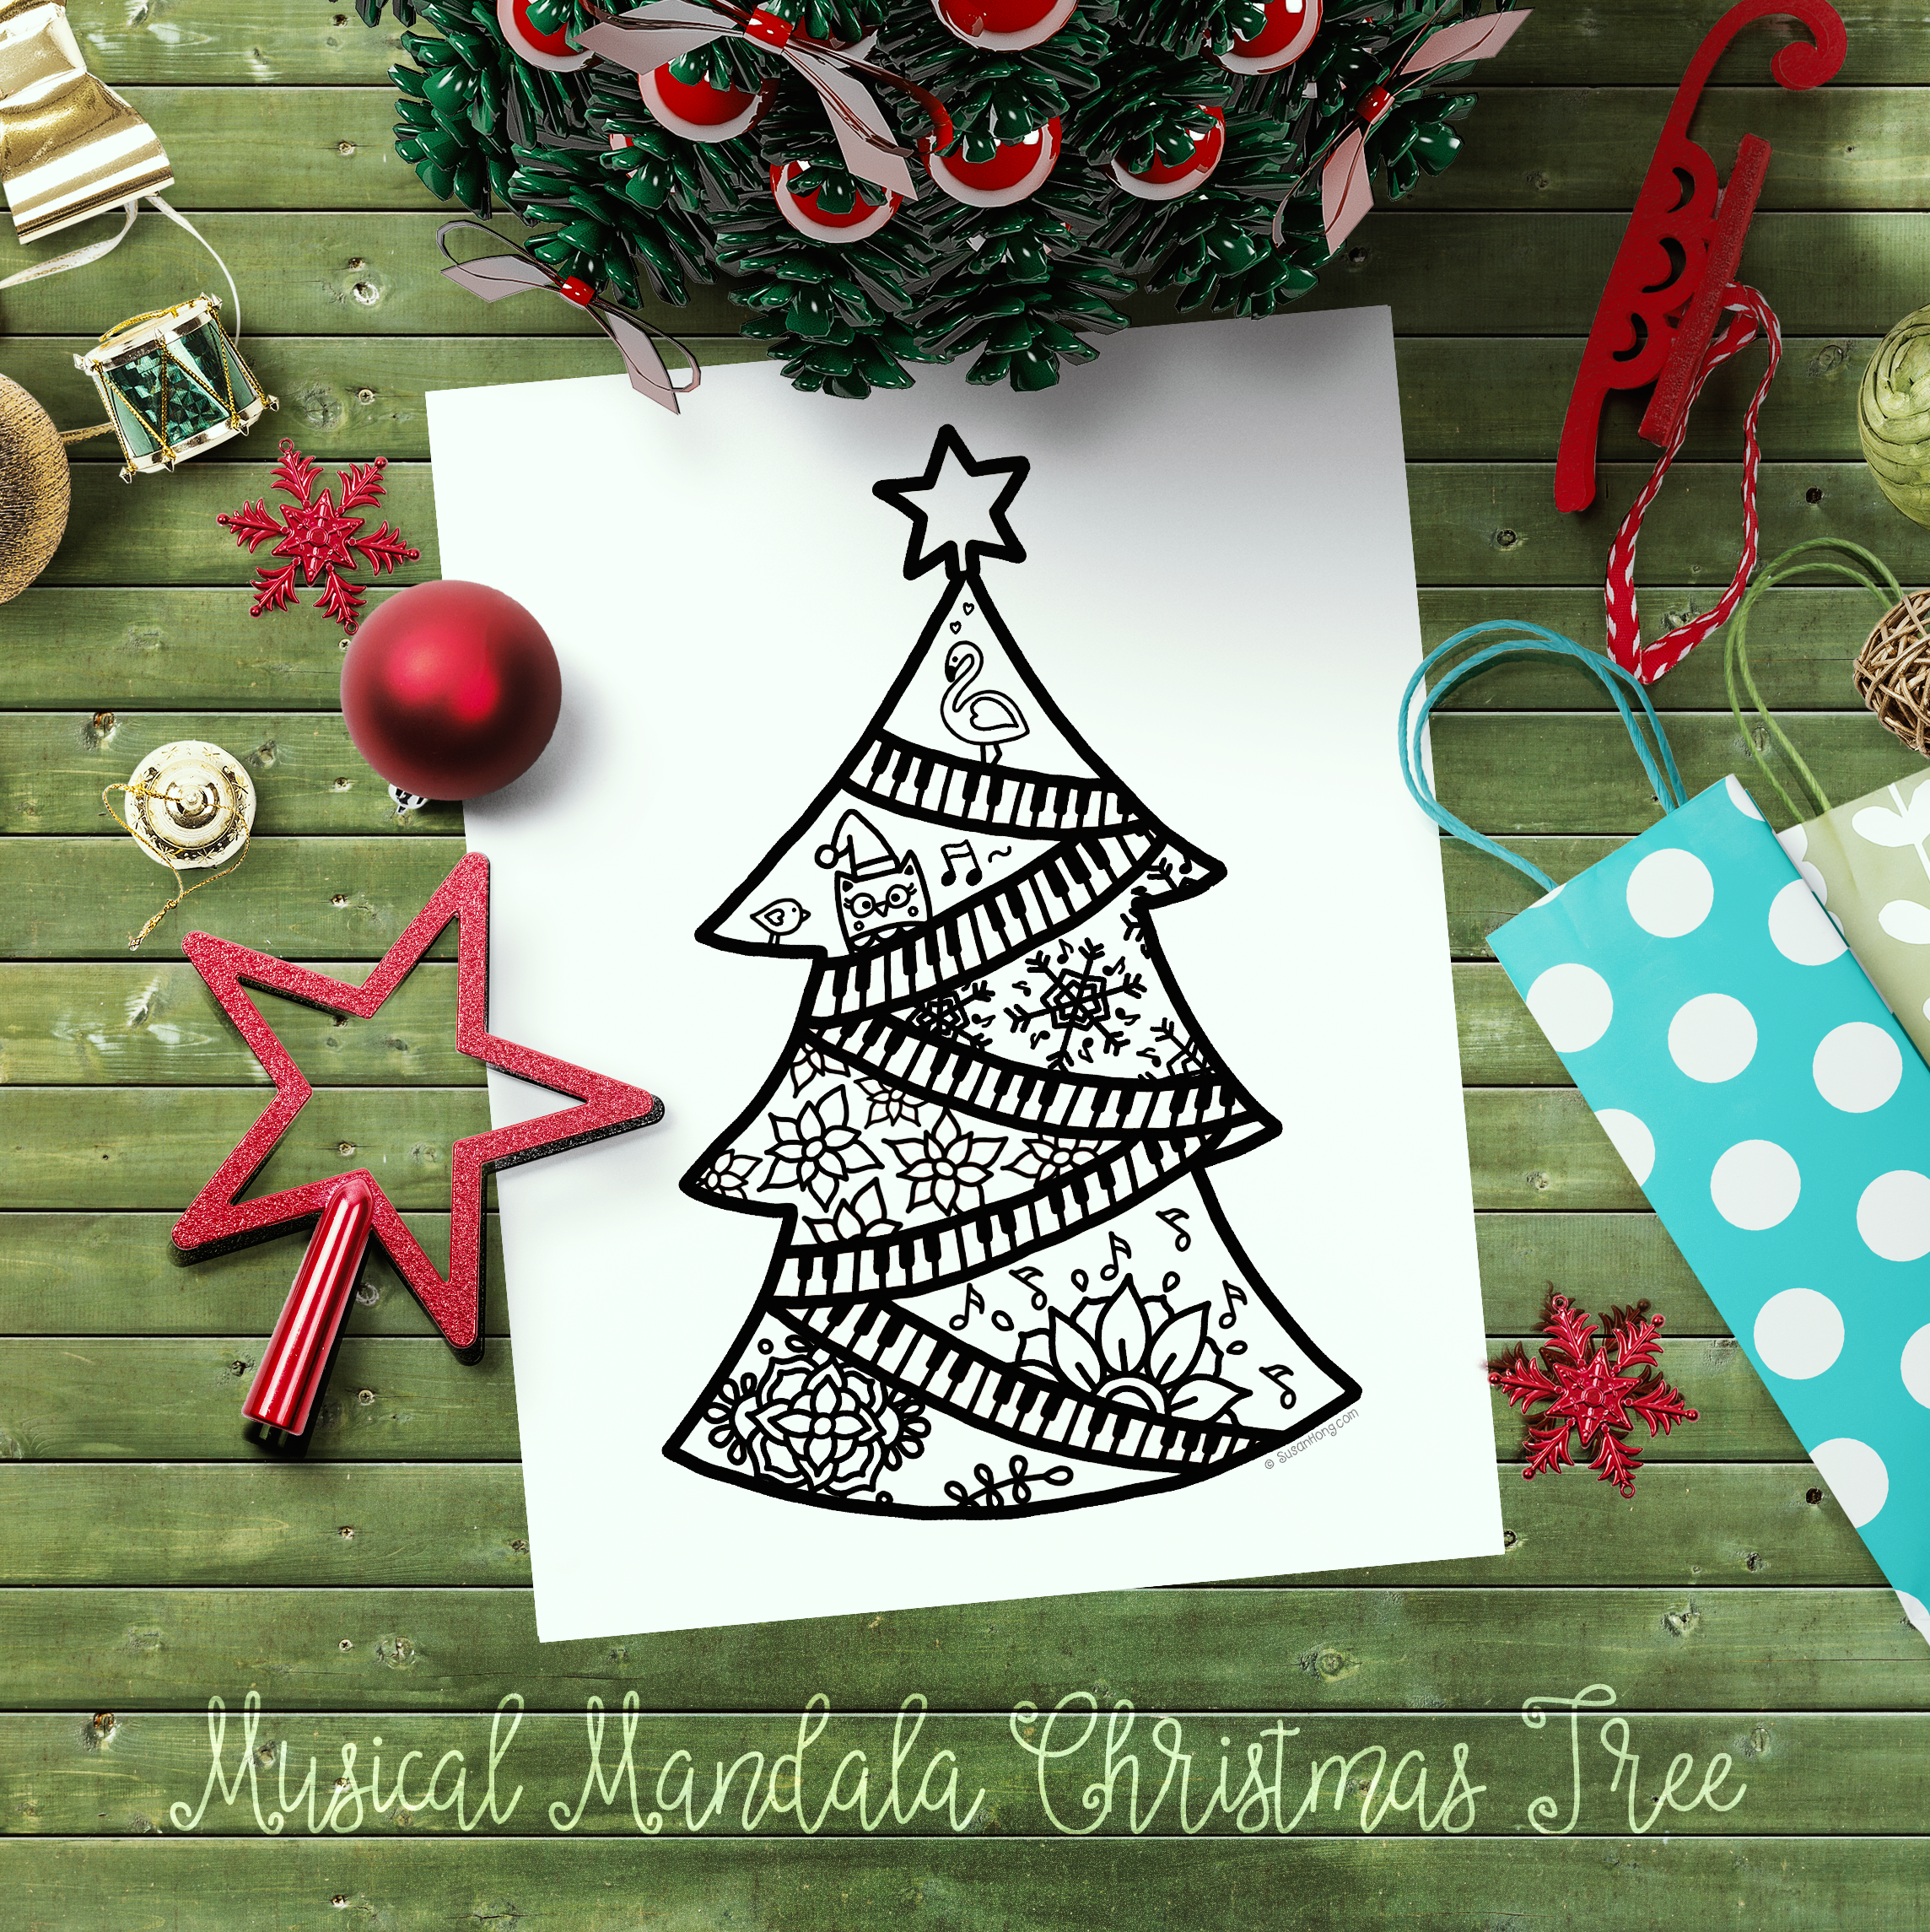 Musical Mandala Christmas Tree with bonus coloring page